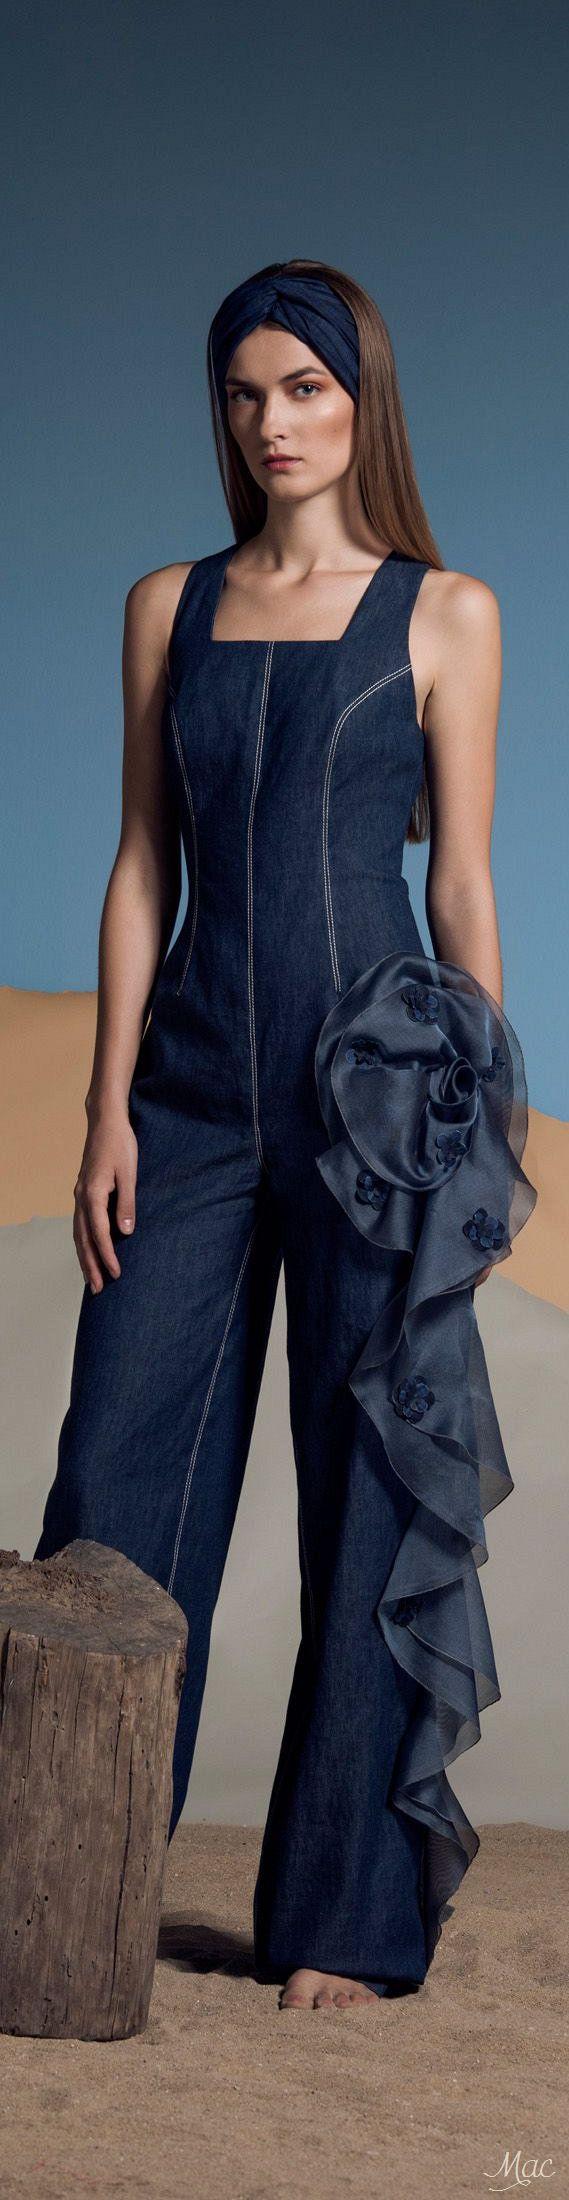 #Farbbberatung #Stilberatung #Farbenreich mit www.farben-reich.com Spring 2017 Ready-to-Wear Georges Chakra